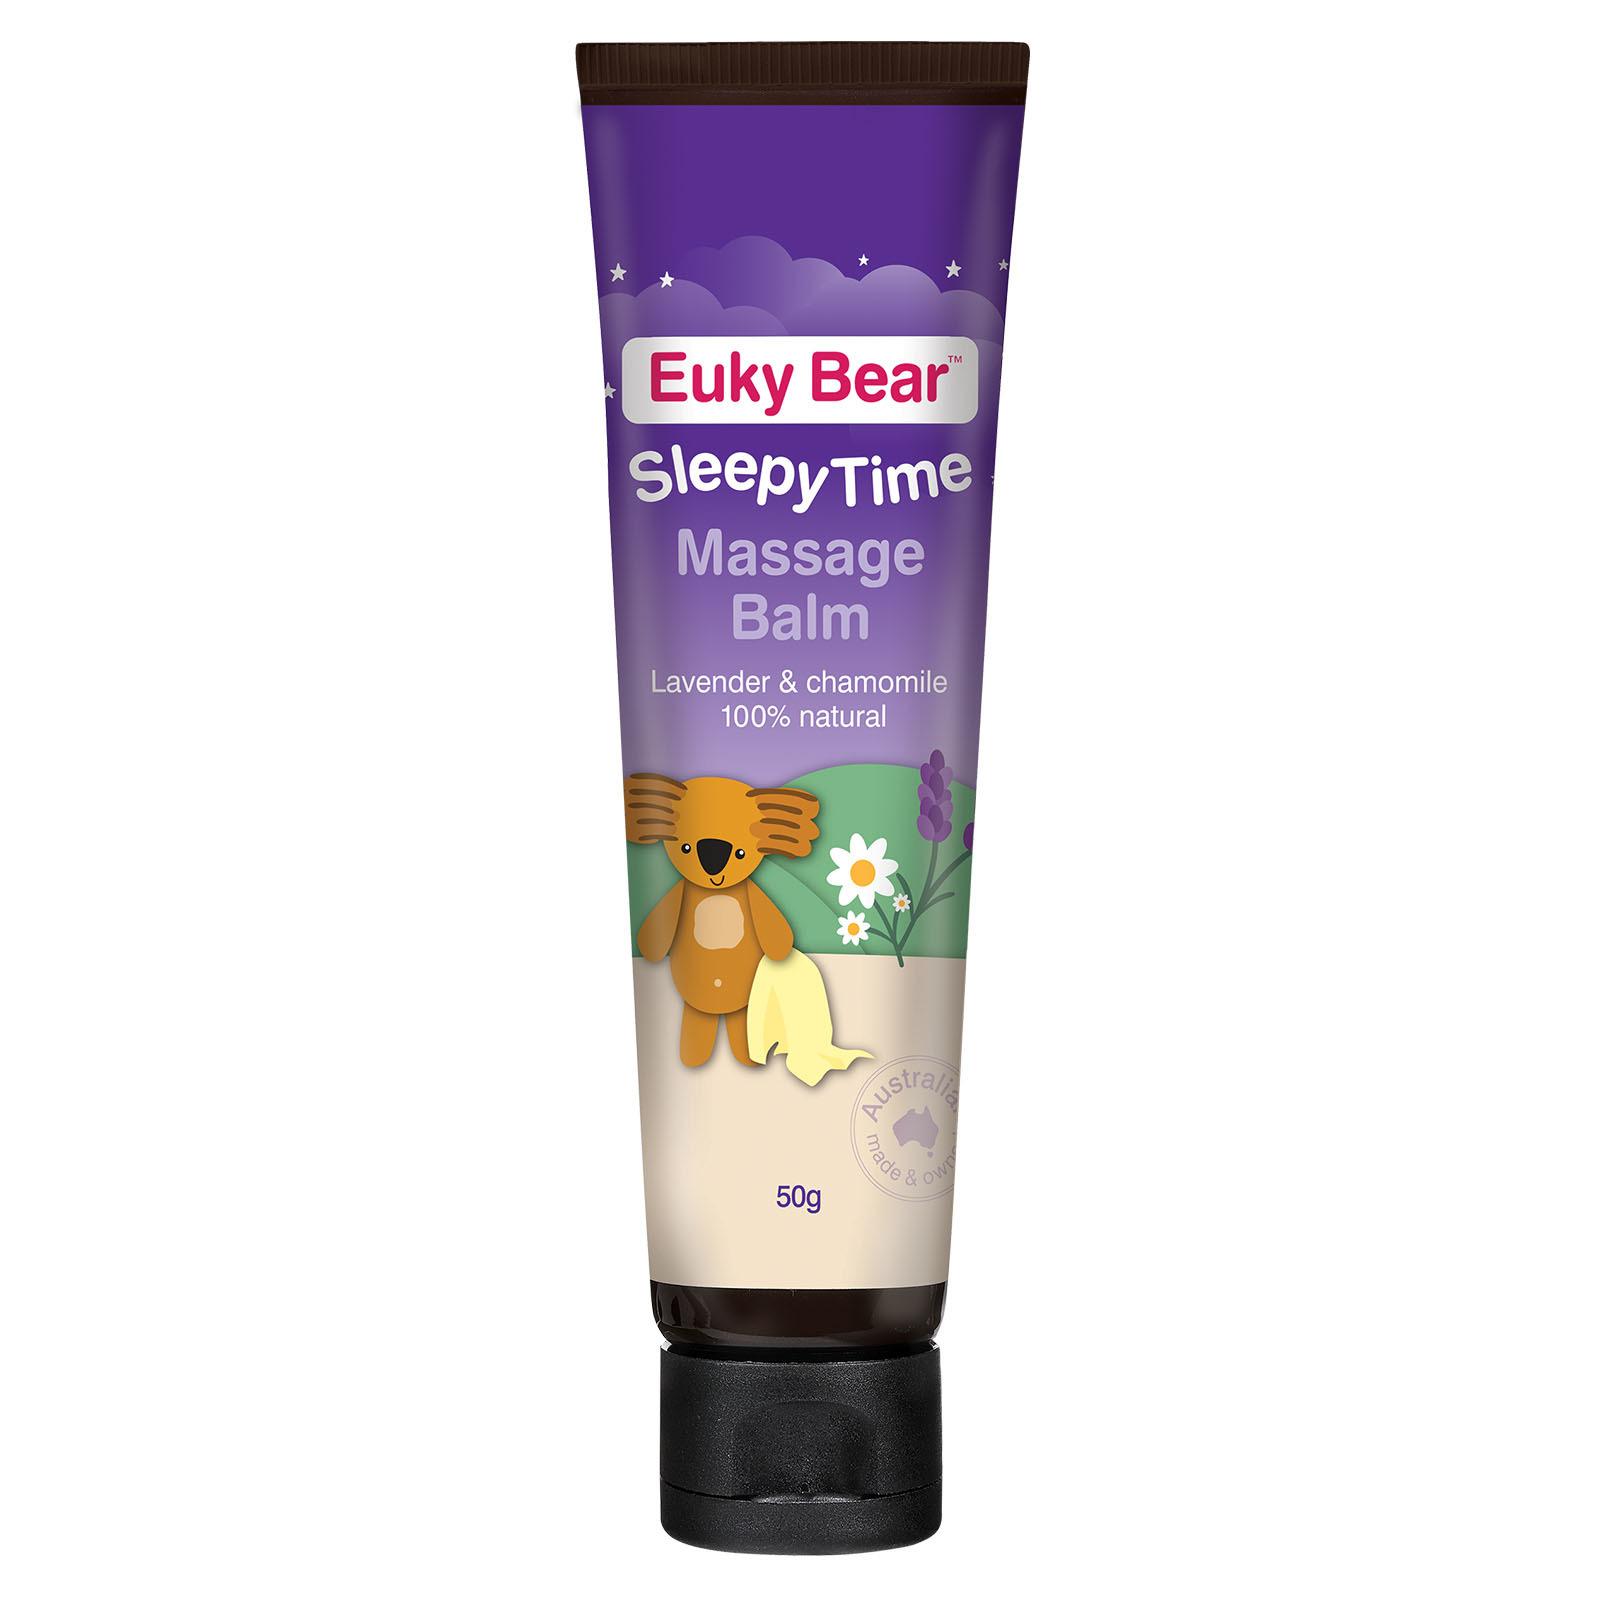 Euky Bear Sleepy Time Massage Balm